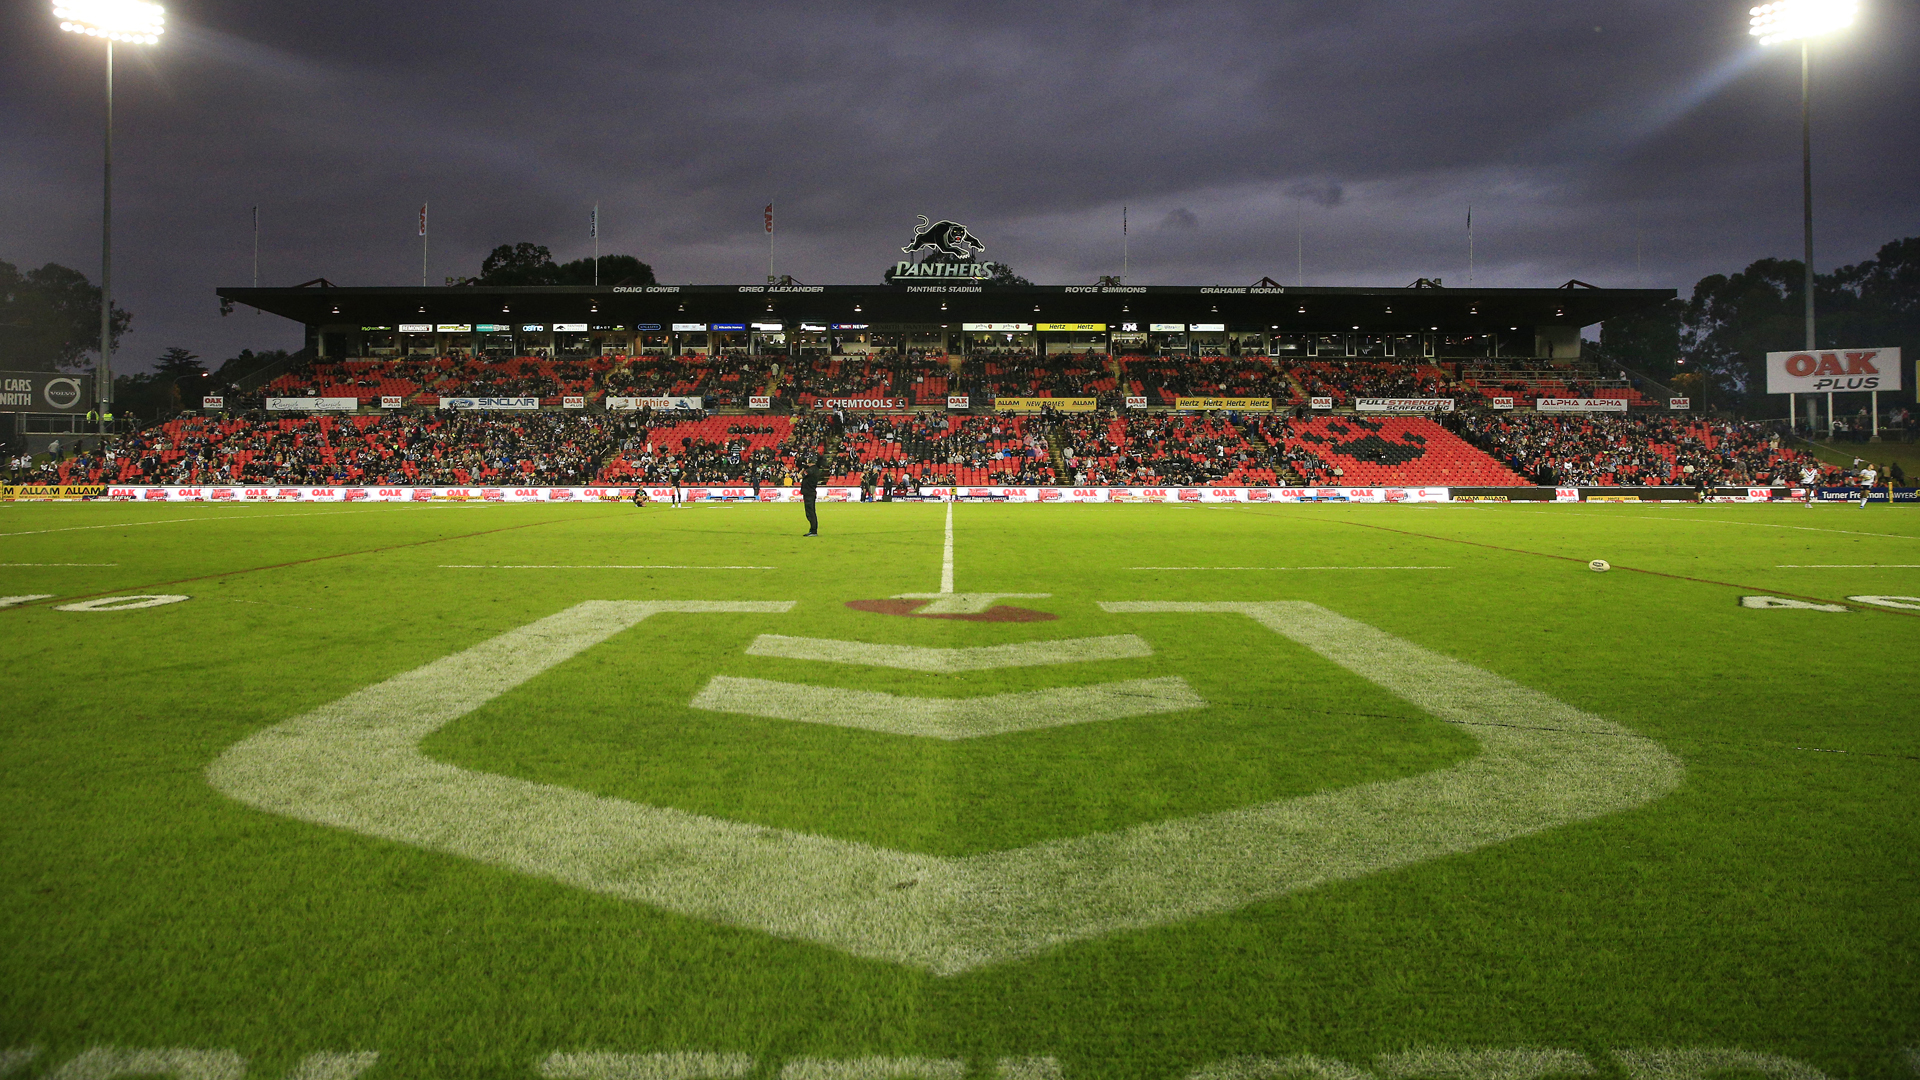 Peter V'landys feels NRL crowds should be back, but New South Wales premier Gladys Berejiklian doubts it can even happen in July.